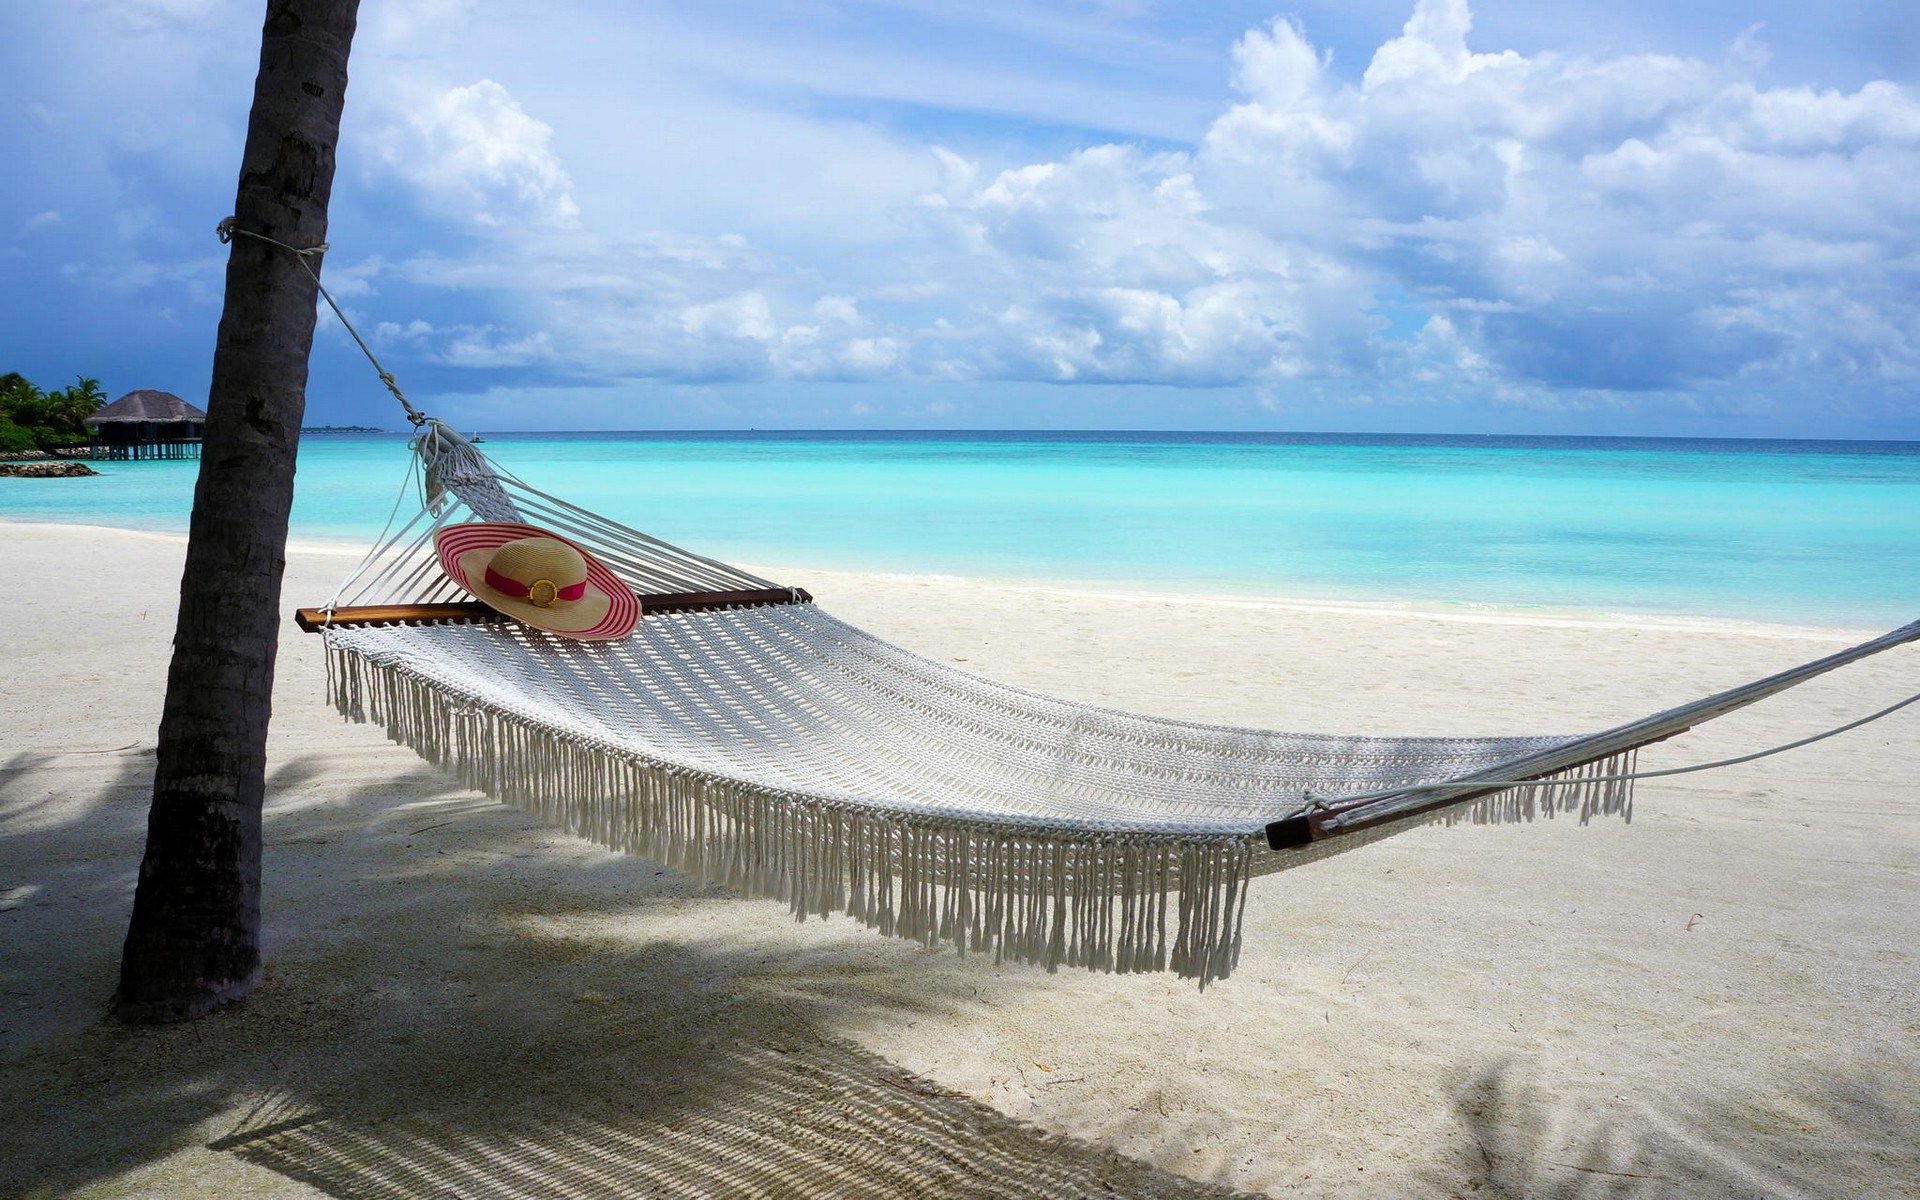 Wallpaper : 1920x1200 px, beach, clouds, hammocks, island, landscape ...